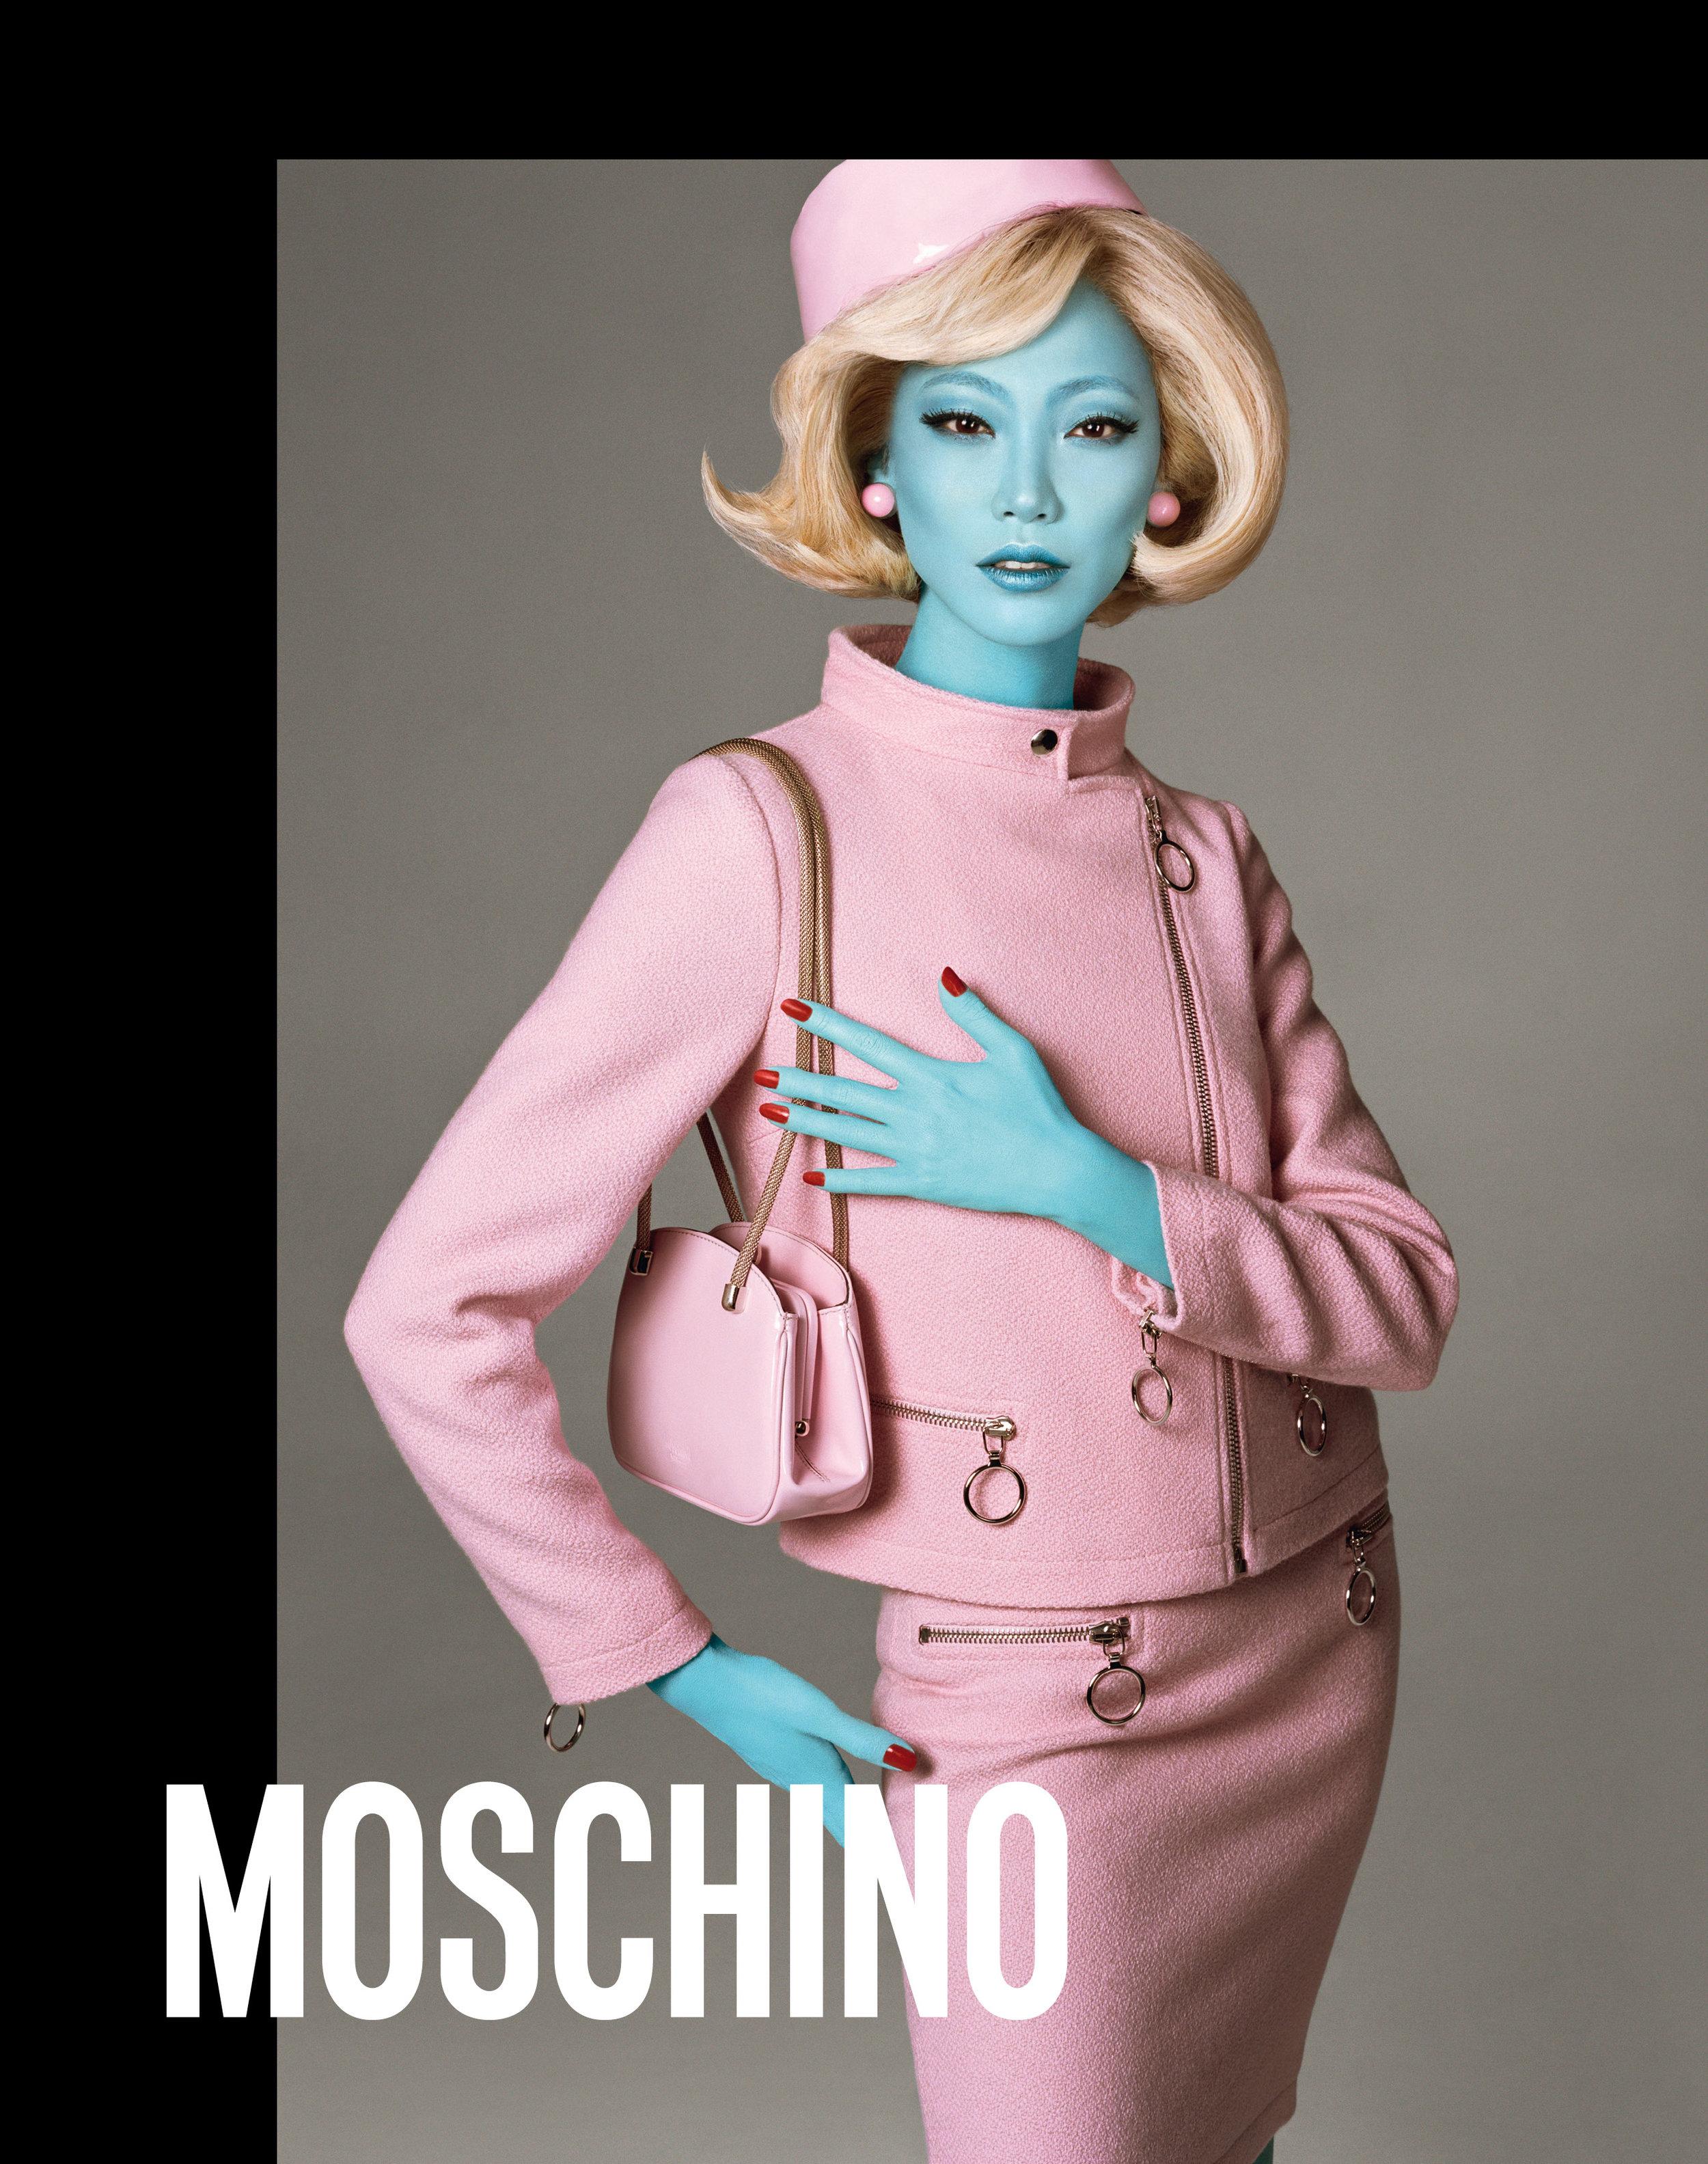 Moschino_4_90_moschino_fw_18_19_adv_campaign_images_-_soo-joo_park.jpg